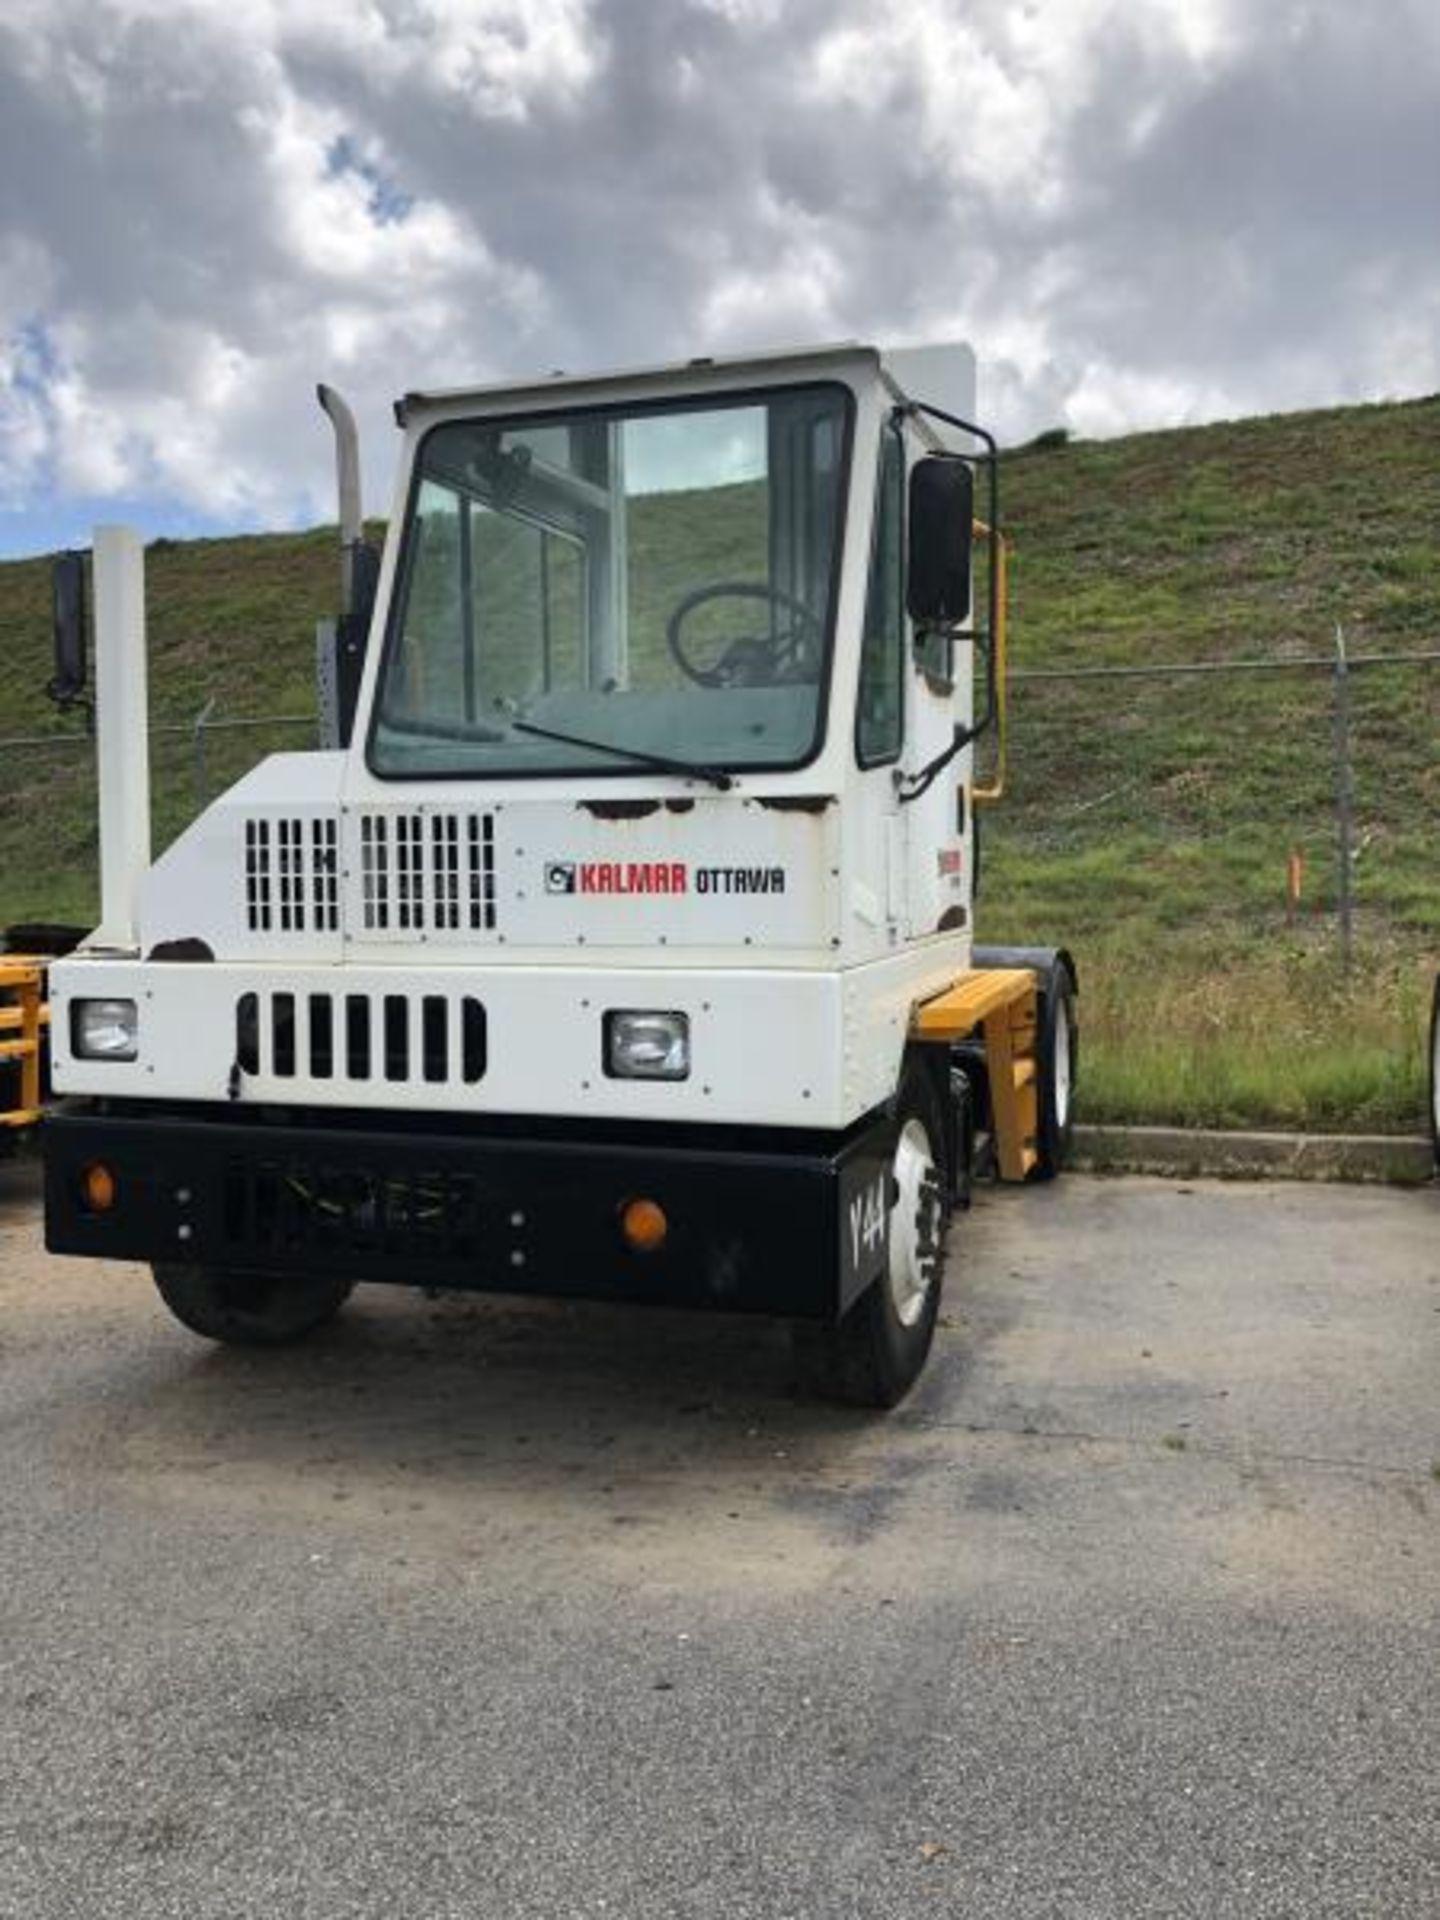 2015 Kalmar Ottawa 4x2 Yard Truck , SN: 338838 3,710.3 Hours, 2,817 Miles - Image 13 of 28